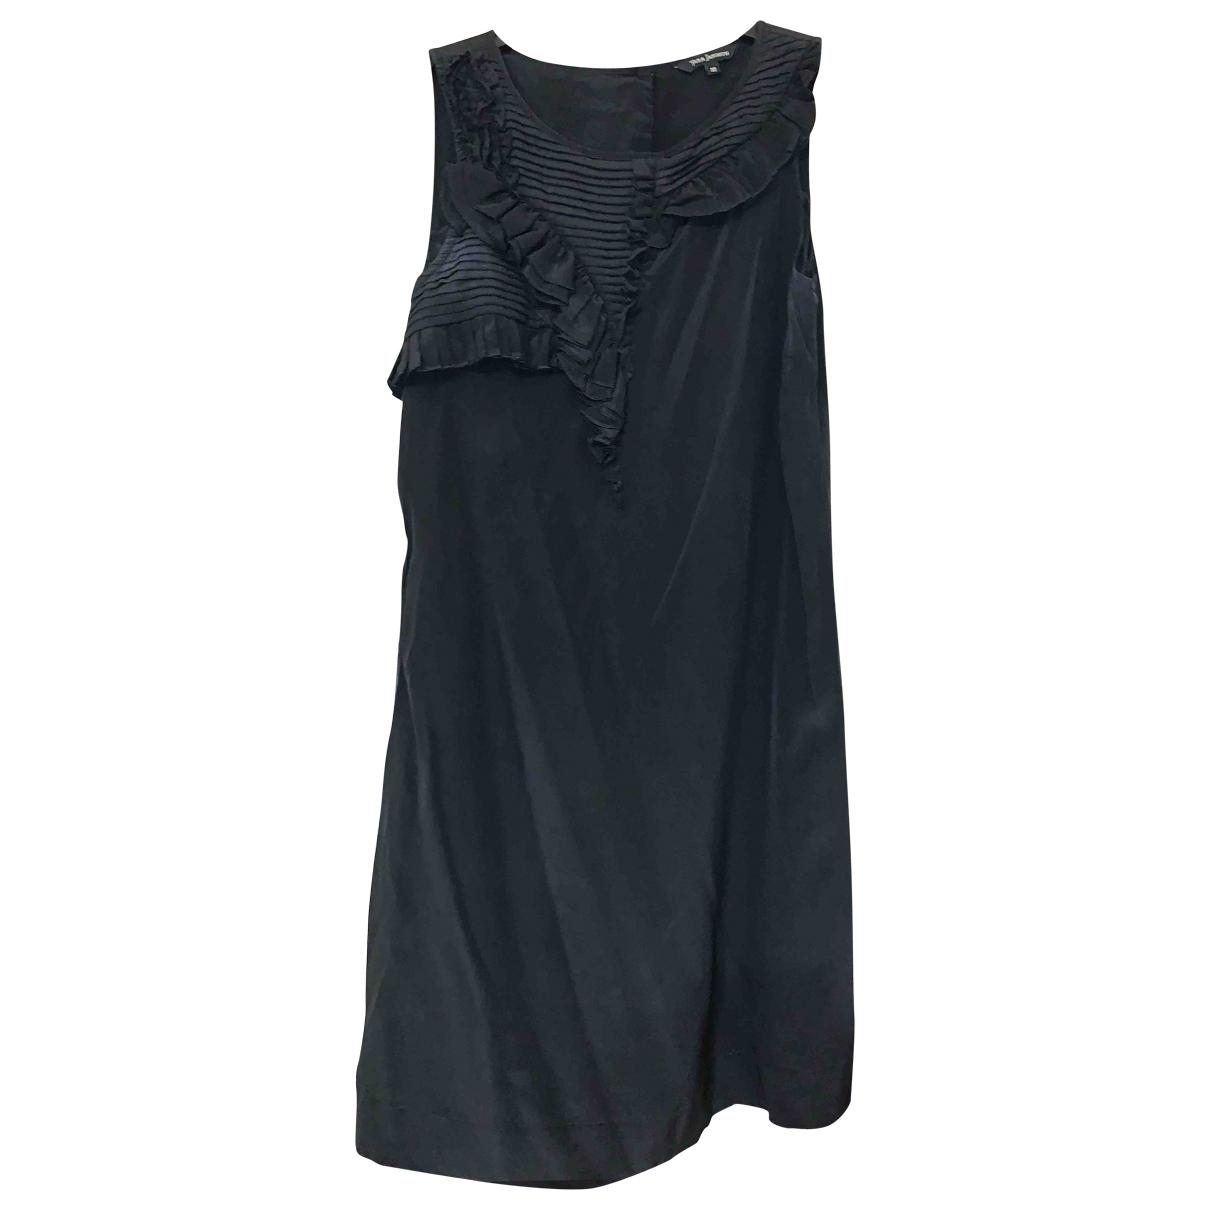 Tara Jarmon \N Black Silk dress for Women 38 FR